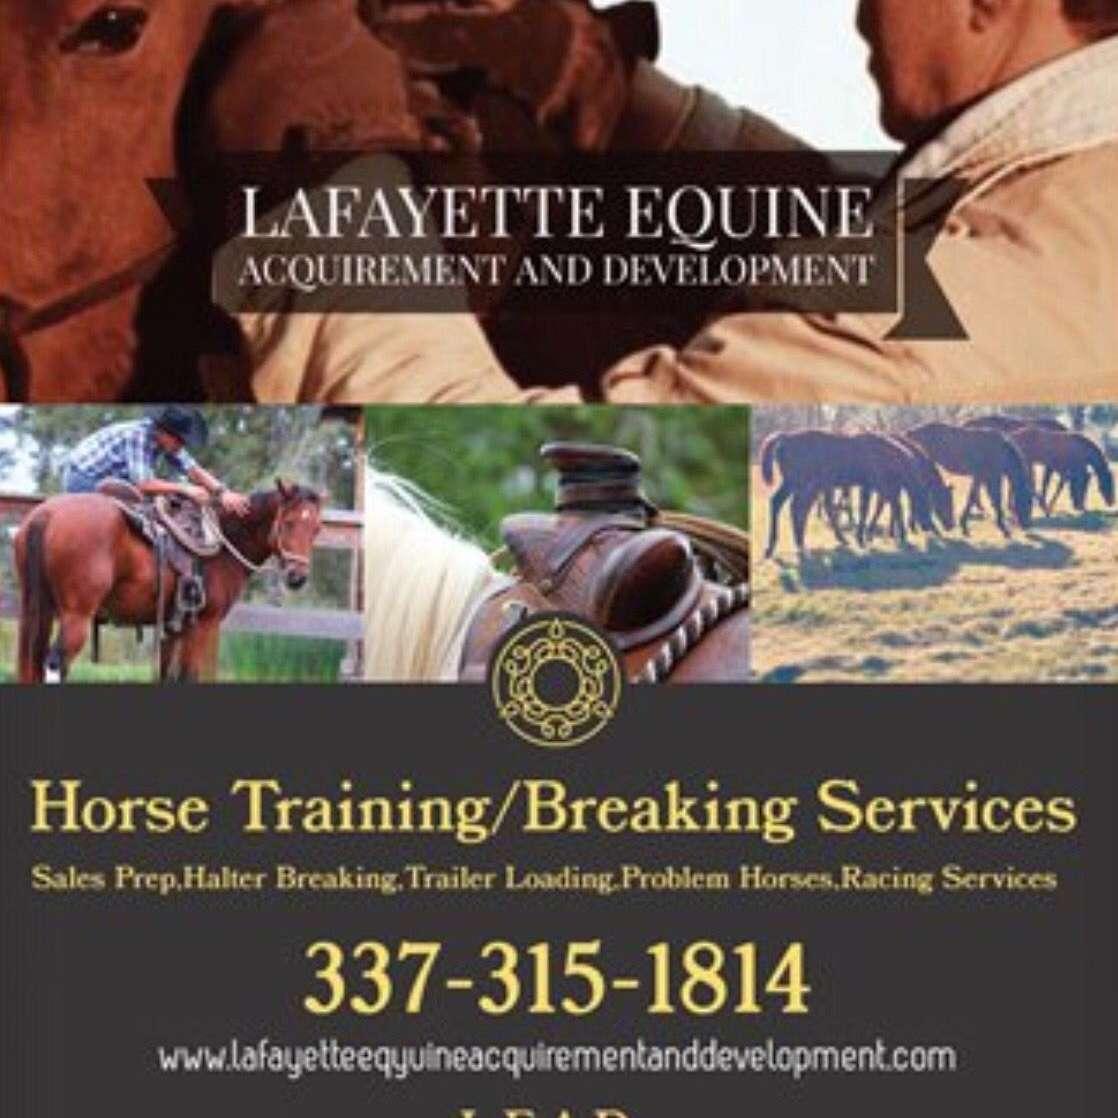 Lafayette Equine Acquirement and Development